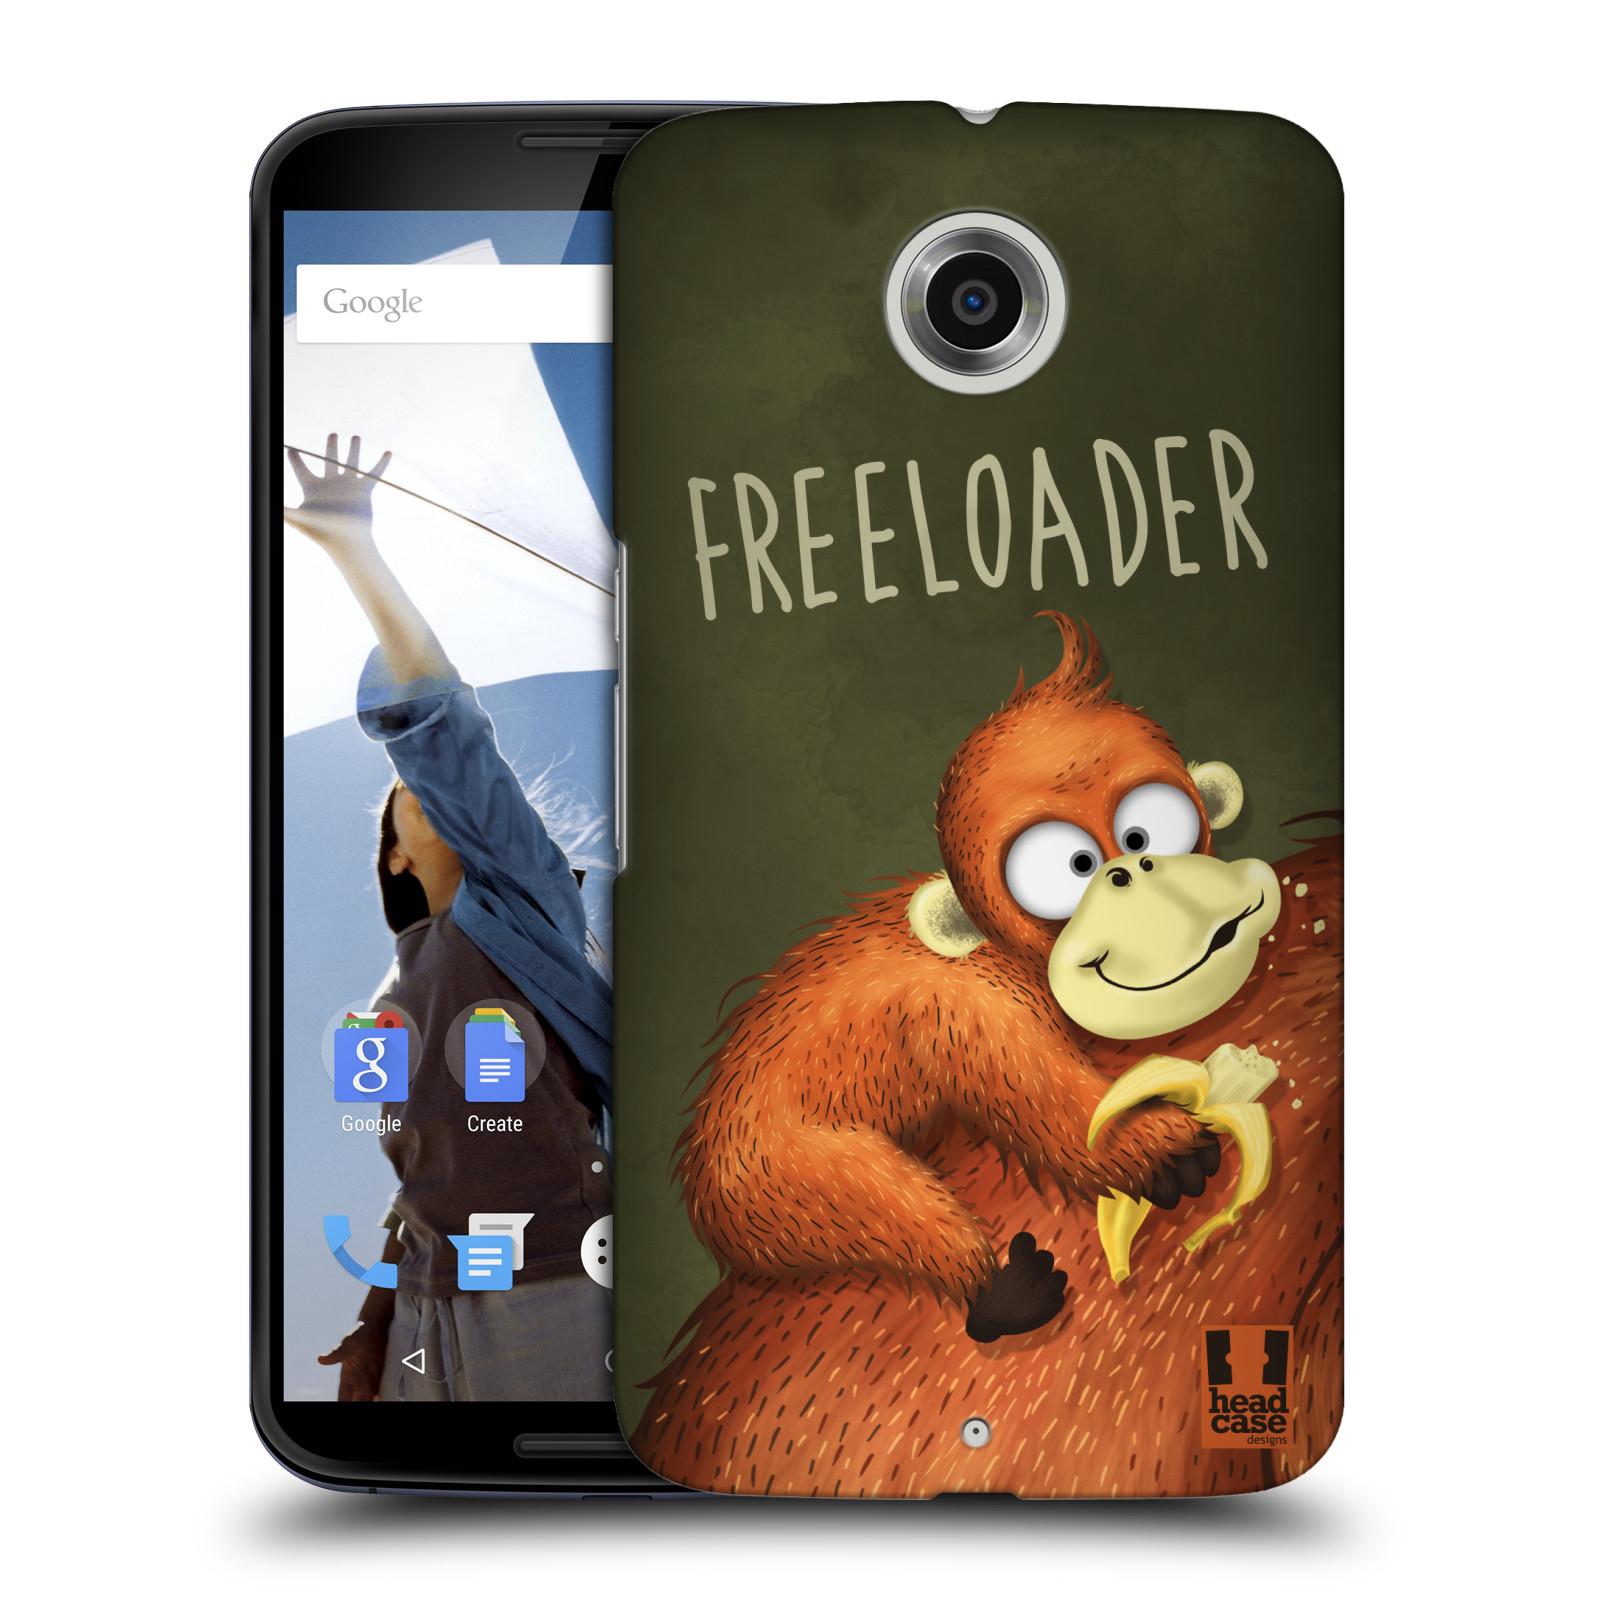 Plastové pouzdro na mobil Motorola Nexus 6 HEAD CASE Opičák Freeloader (Kryt či obal na mobilní telefon Motorola Nexus 6)